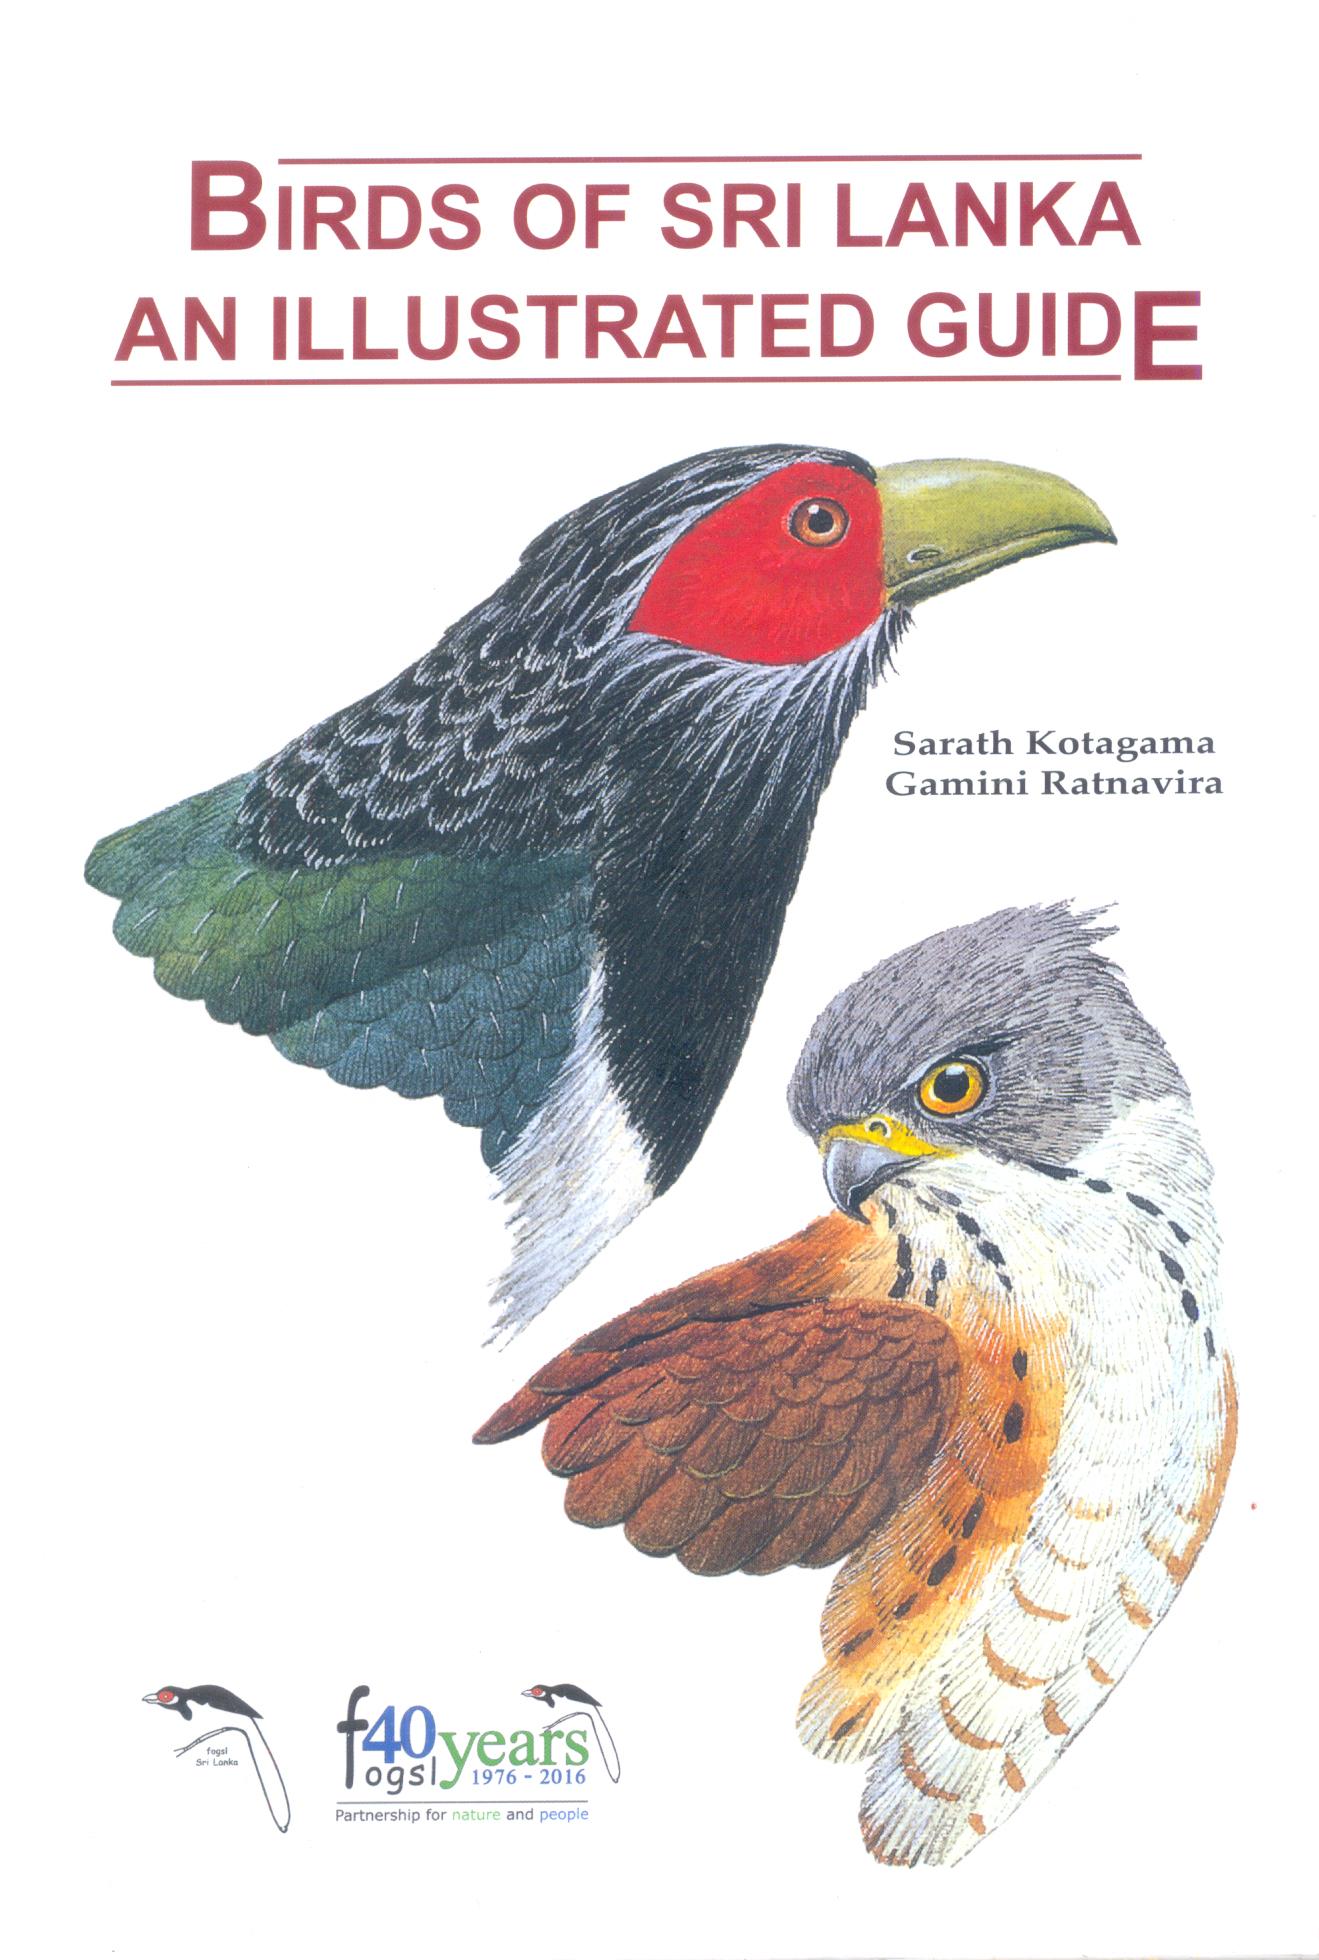 Birds of Sri Lanka An Illustrated Guide